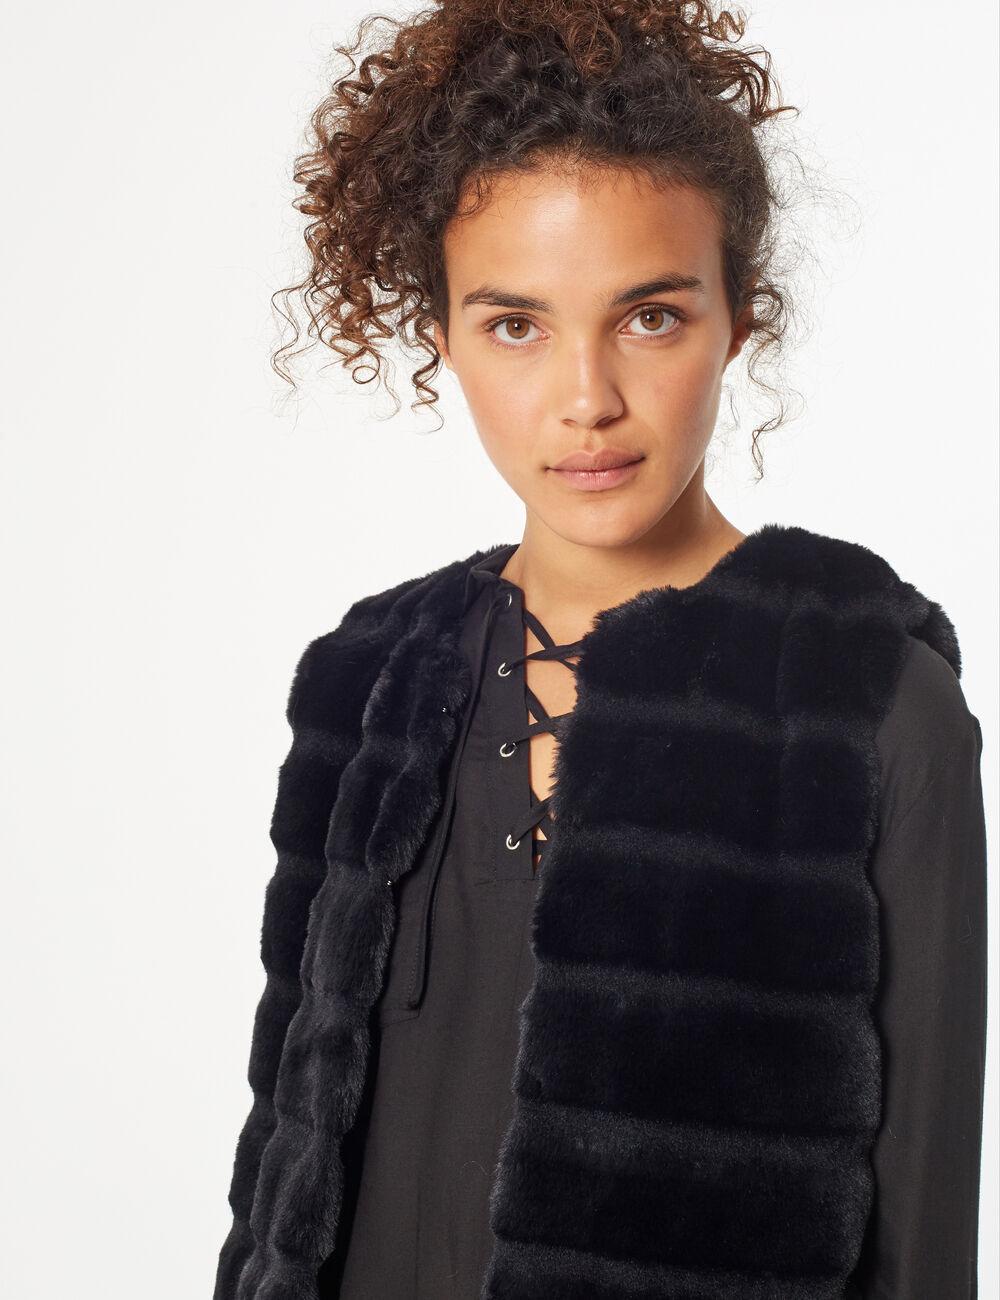 acheter en ligne 150f0 3f3dc Manteau imitation fourrure femme • Jennyfer